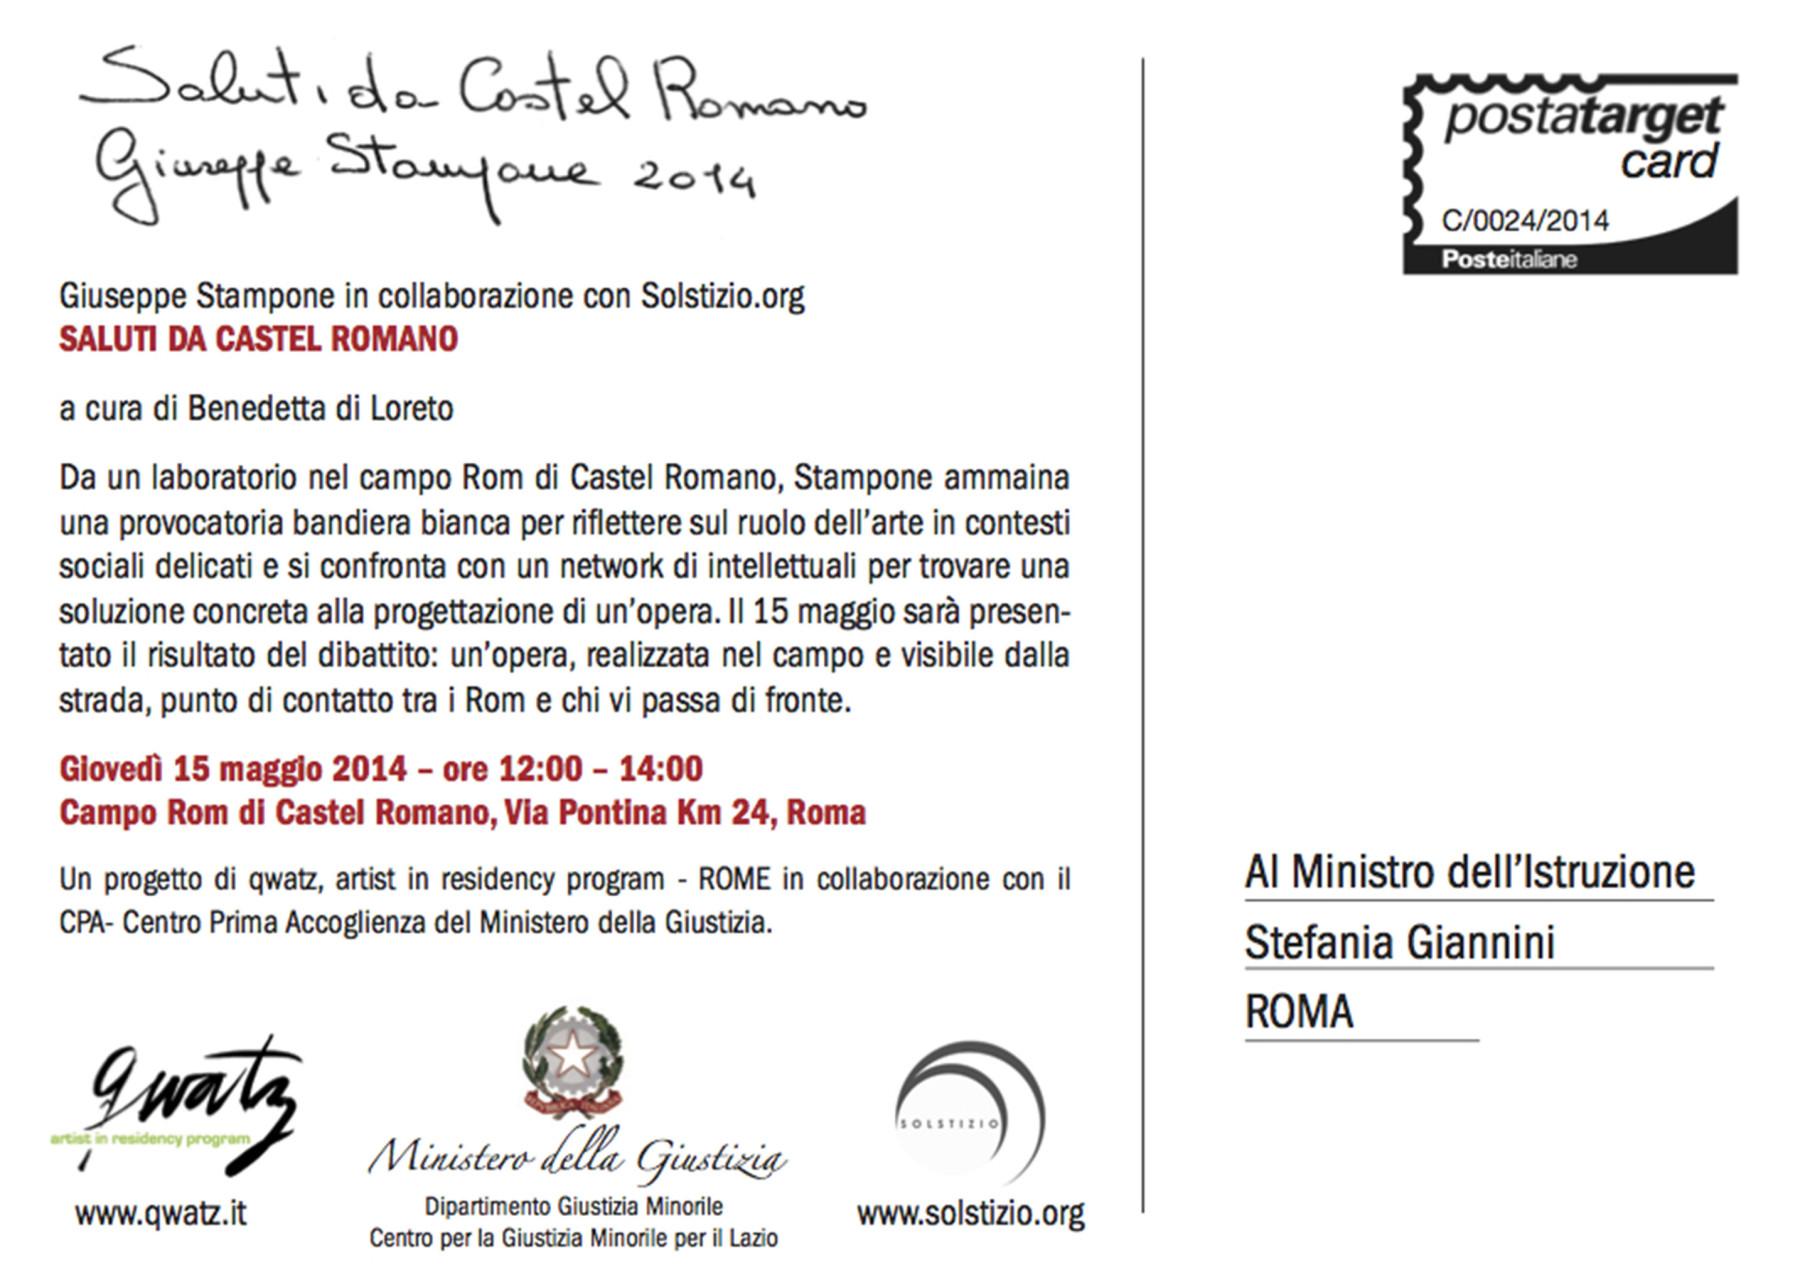 Greetings from Castel Romano02_bassa